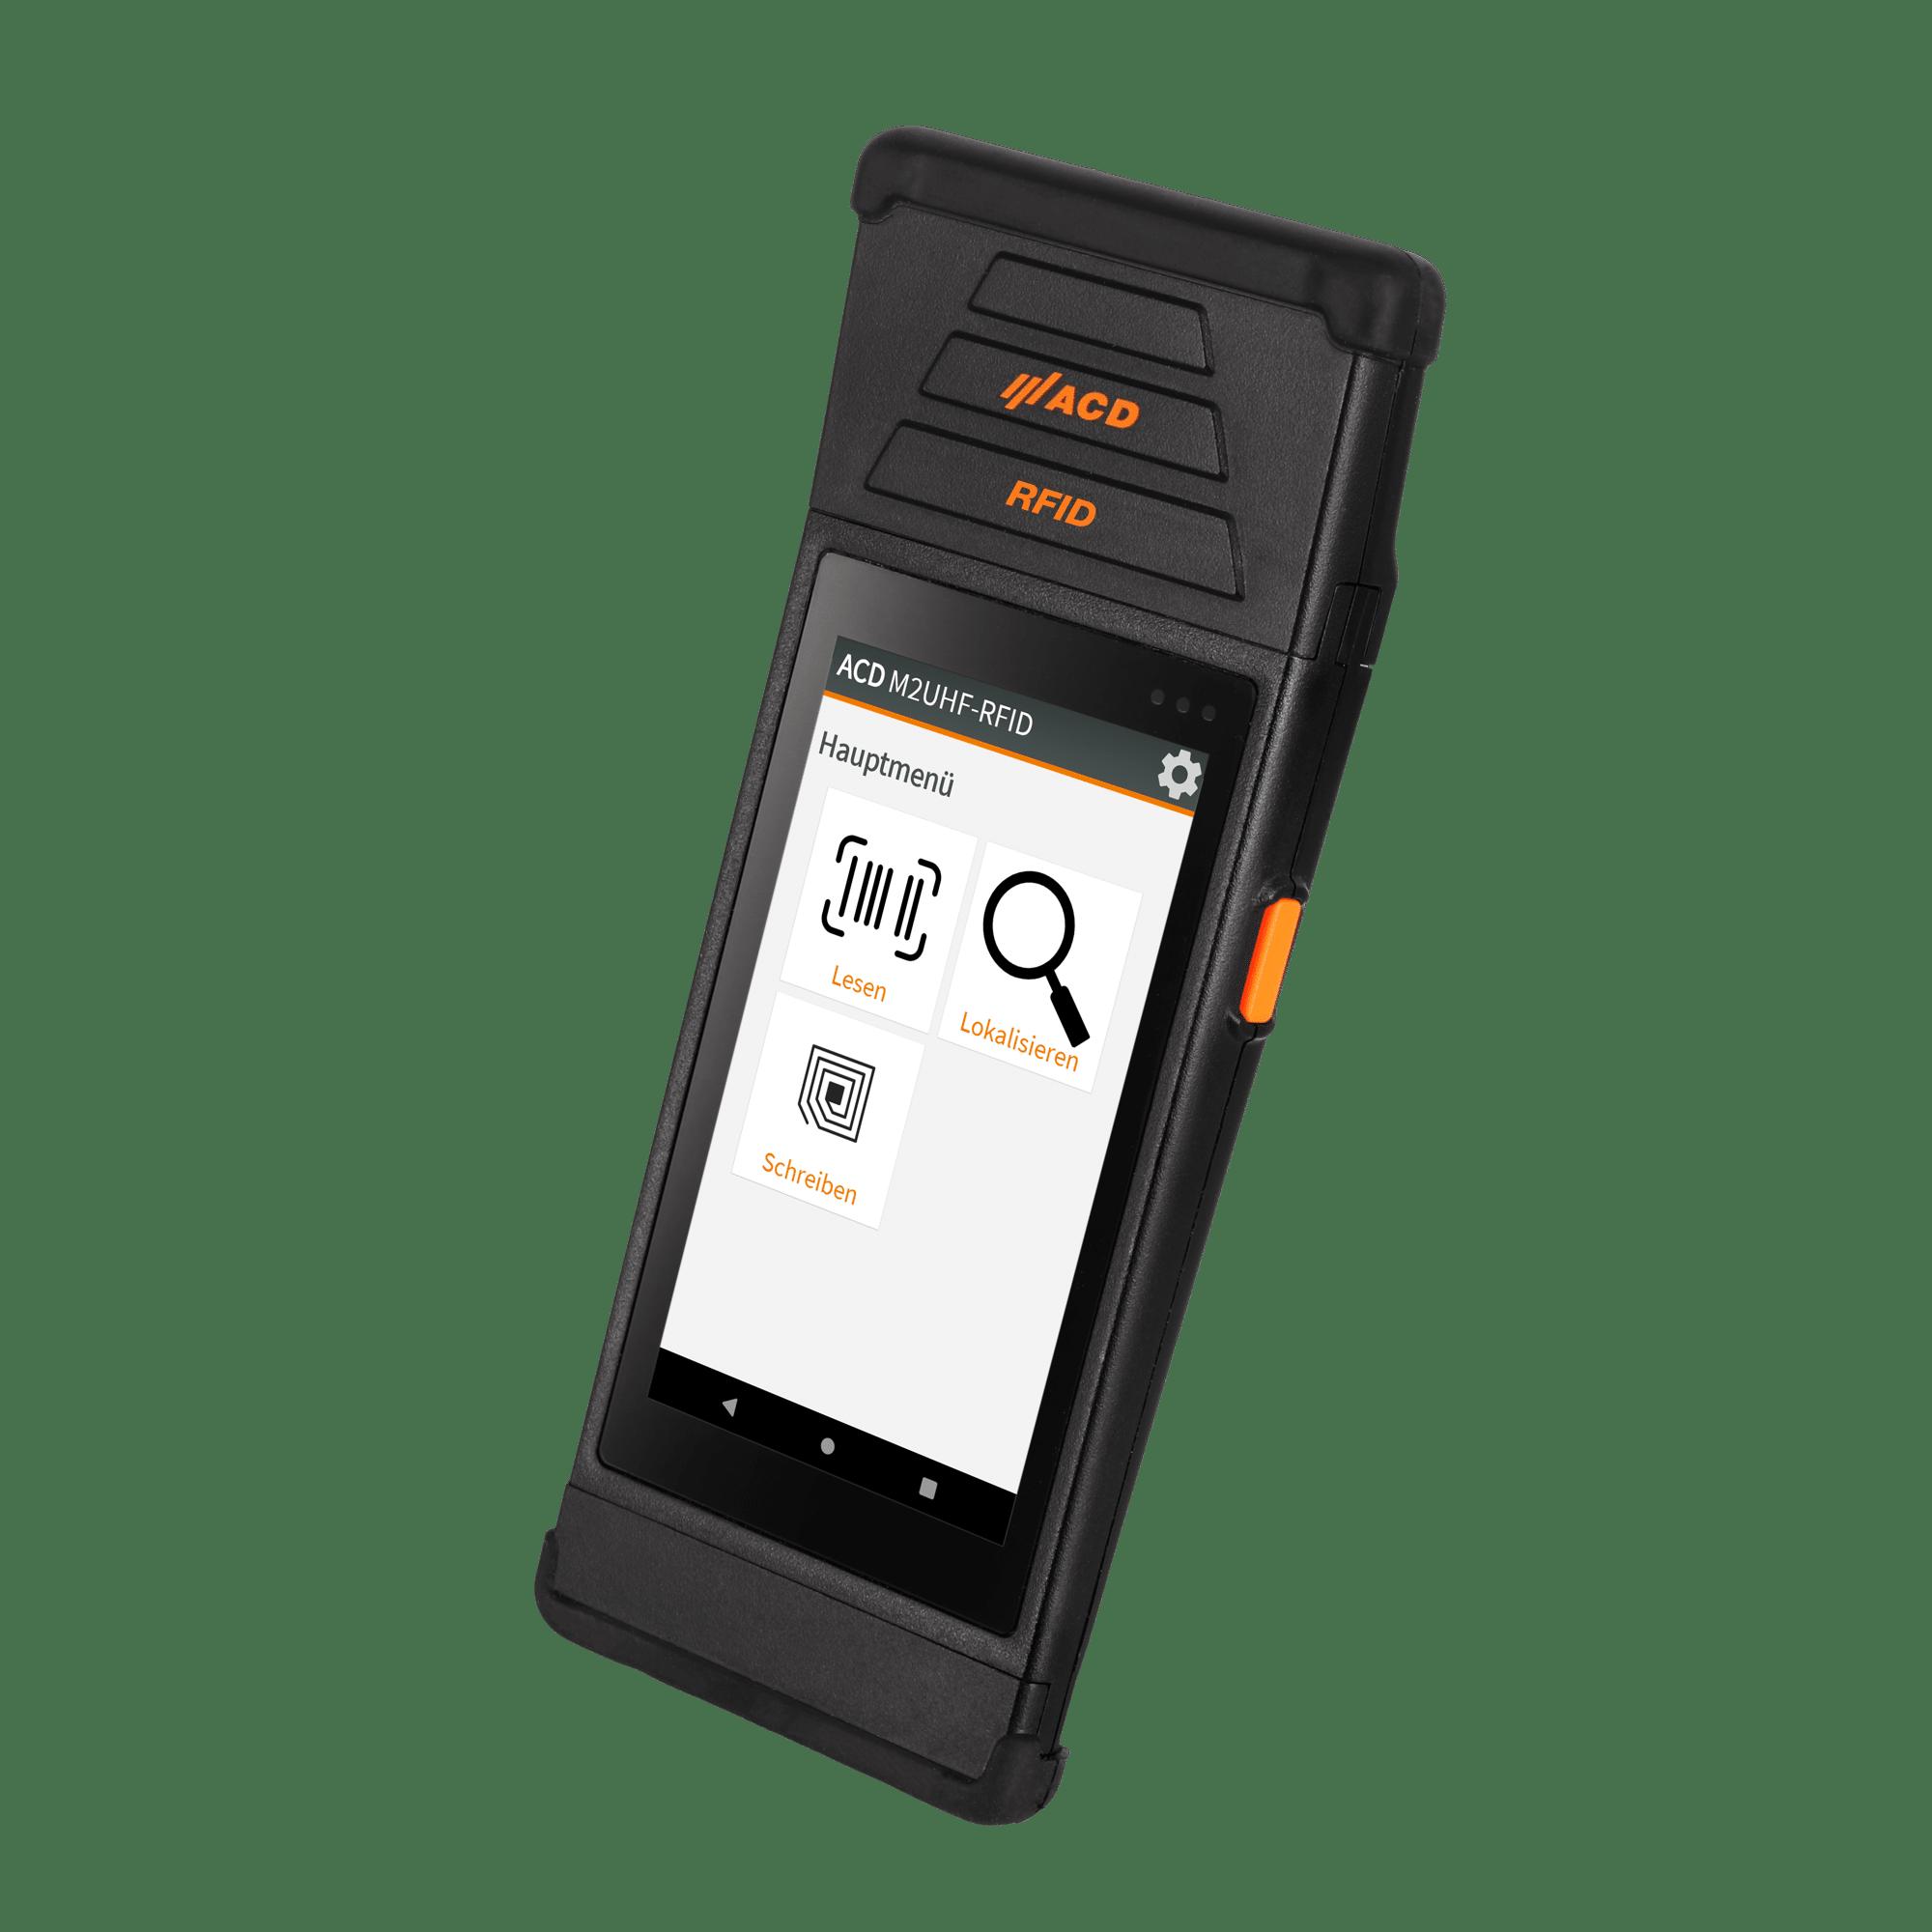 m2smart-se-uhf-rfid-05-terminaux-portable-terminaux-mobiles